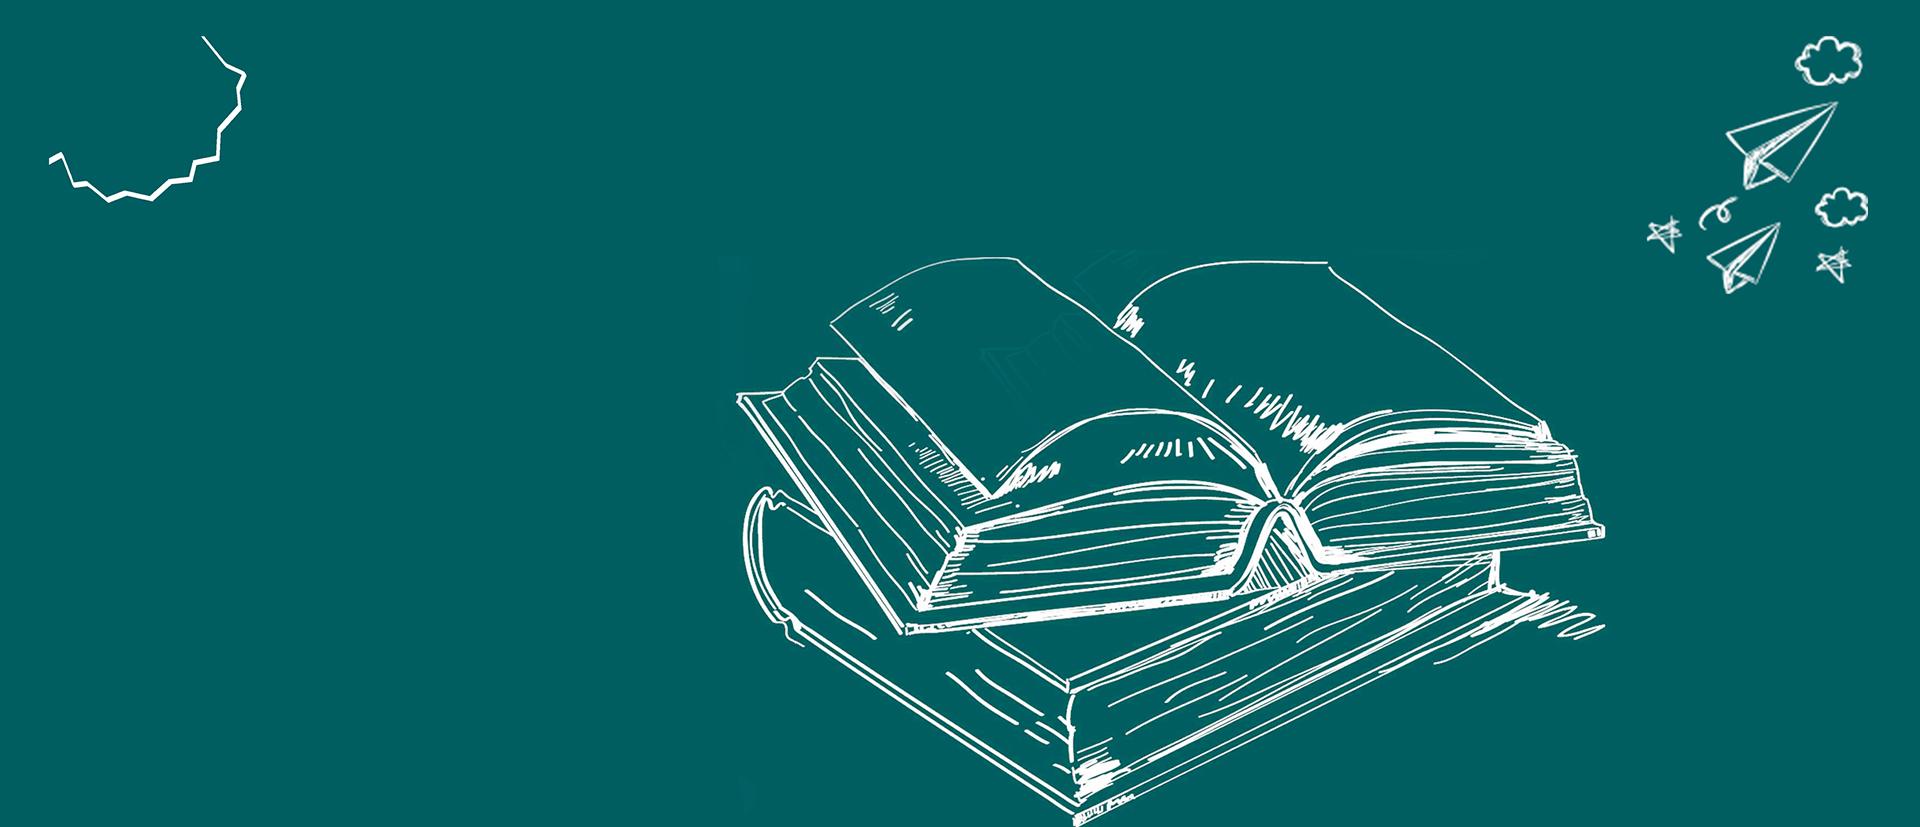 green cartoon handpainted reading education banner  green